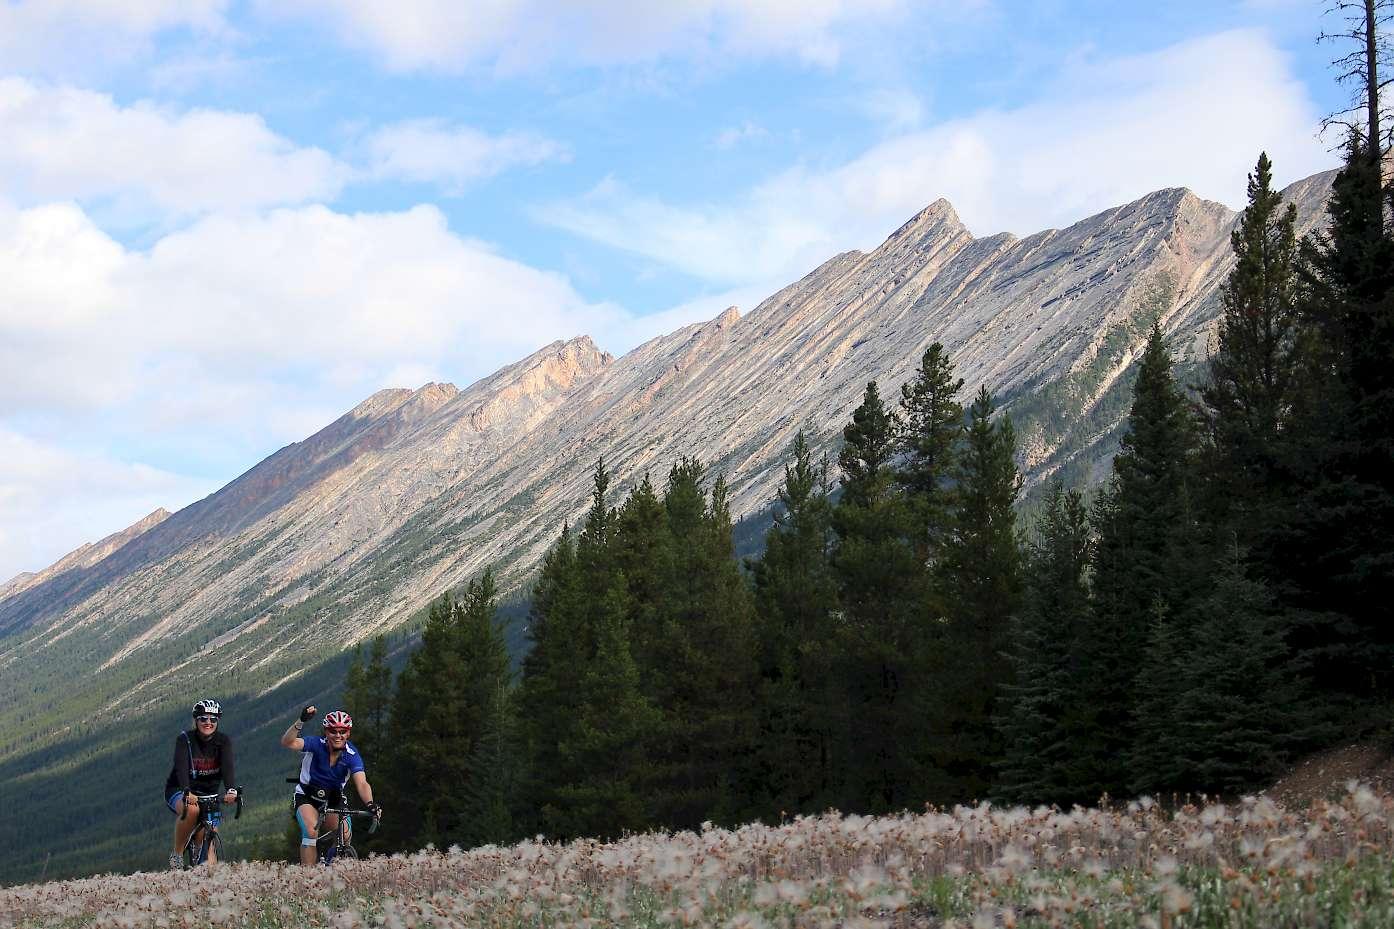 Anna and Dean biking Jasper to Banff.